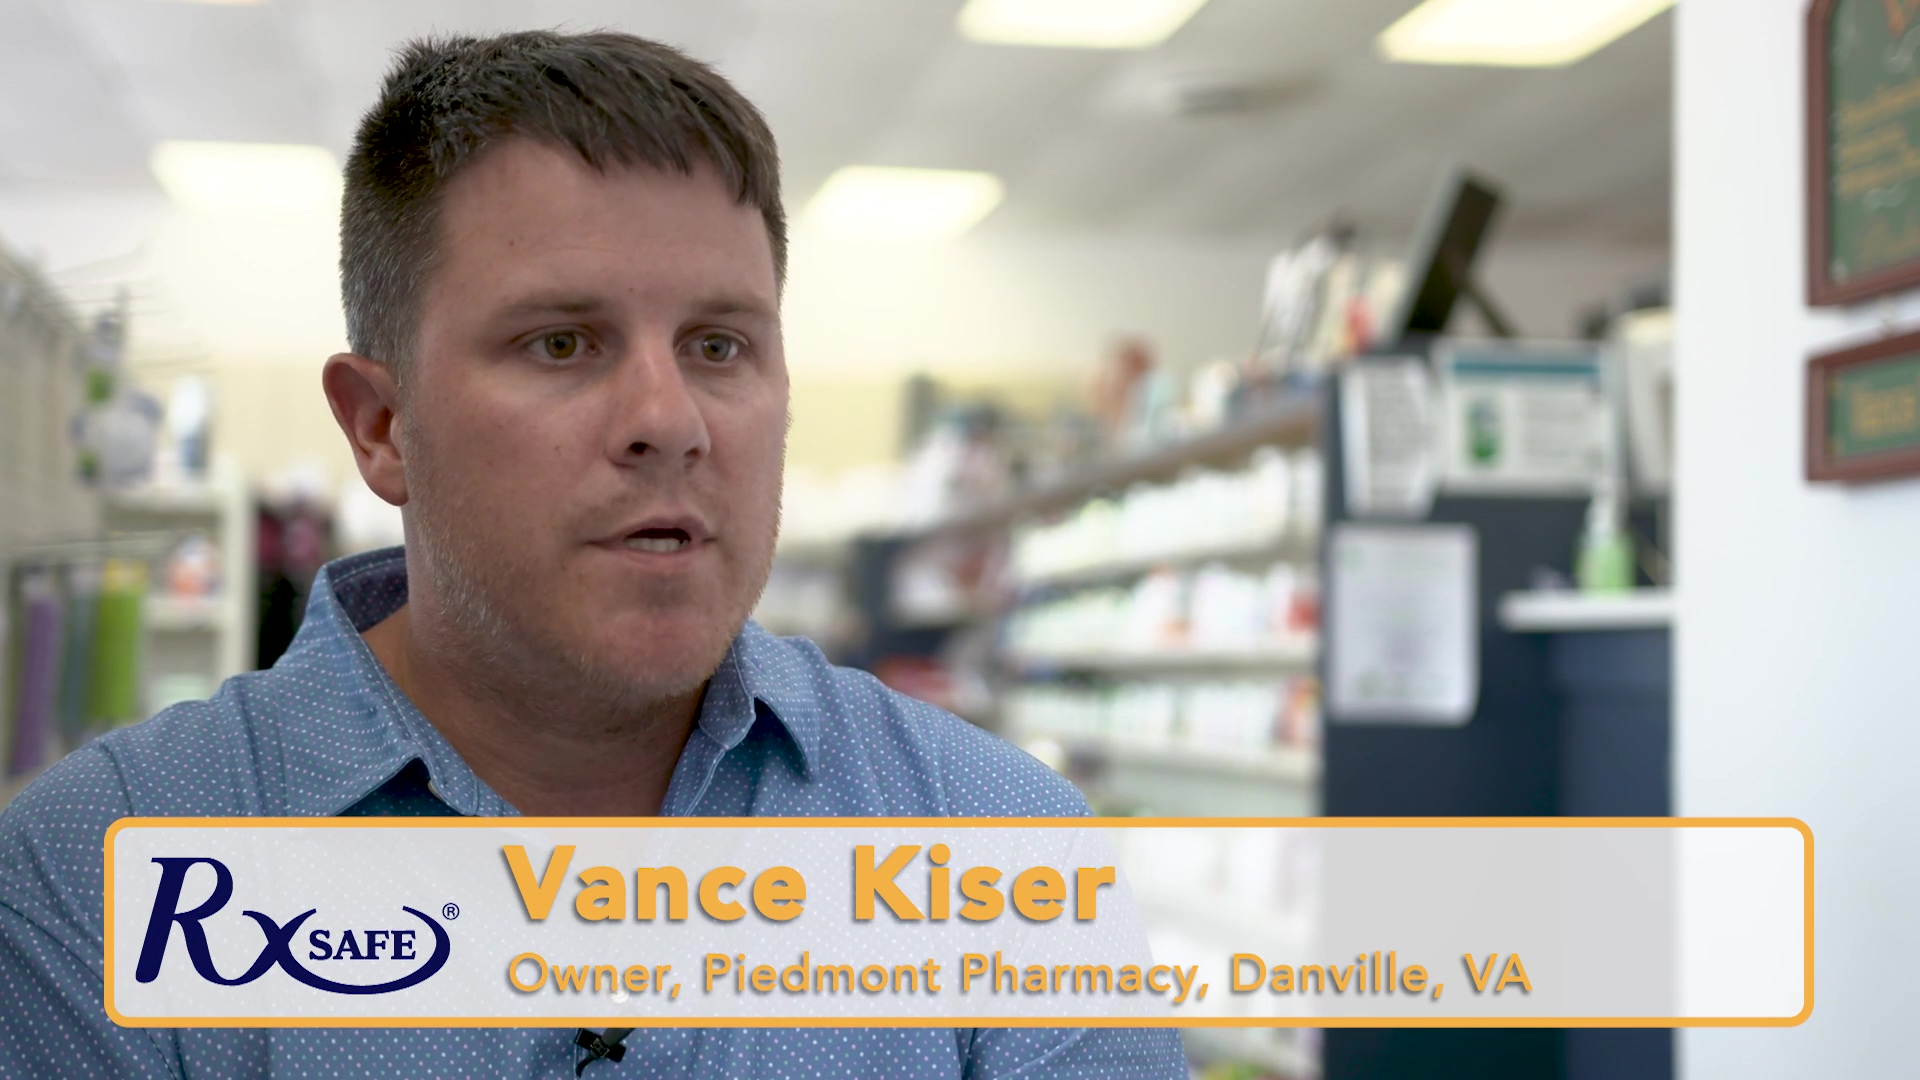 Piedmont Pharmacy Danville VA 2 CAM EDIT 3